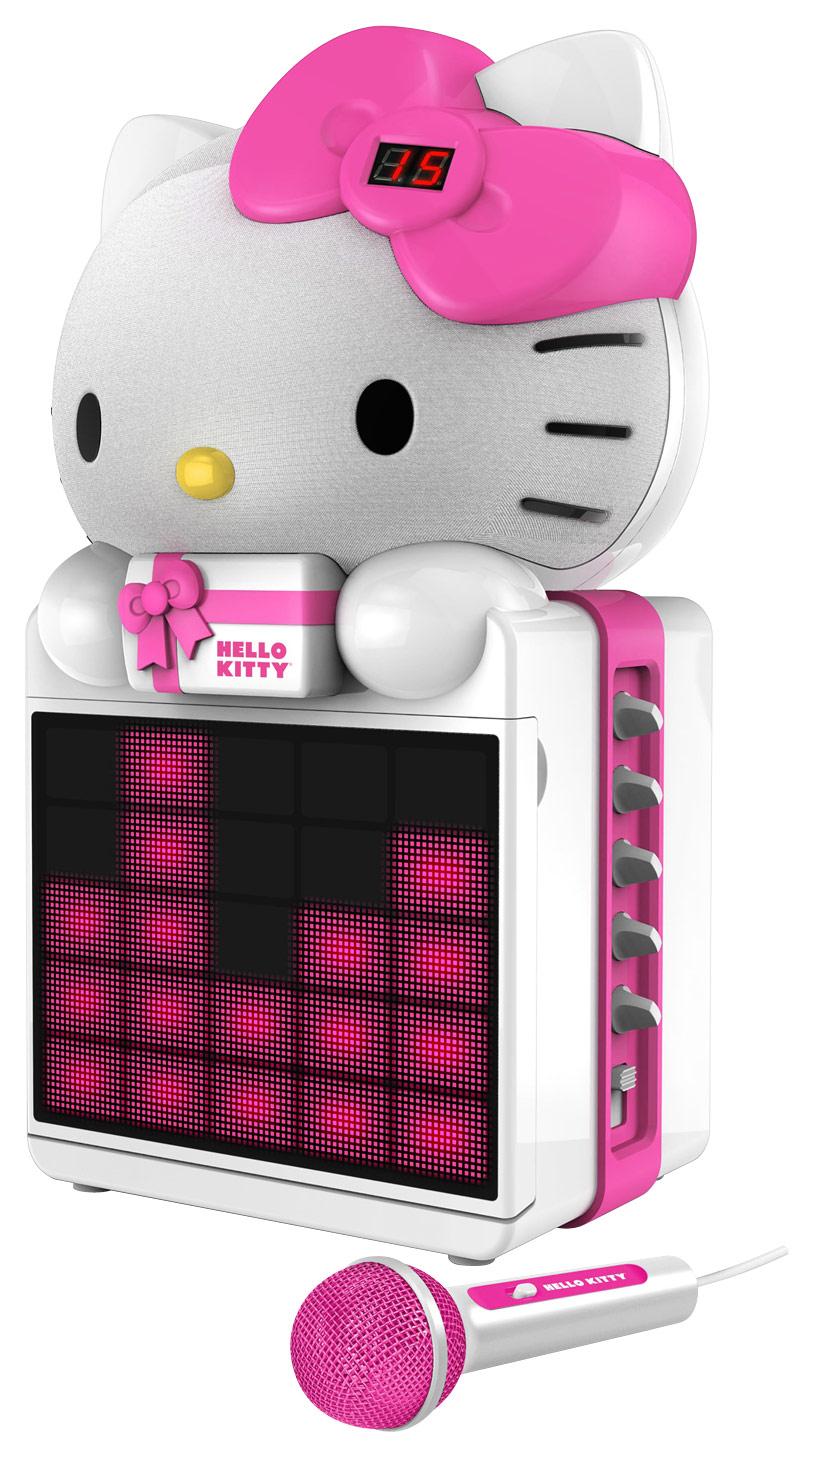 Hello Kitty - Cd+g Karaoke System - Pink/White/Black